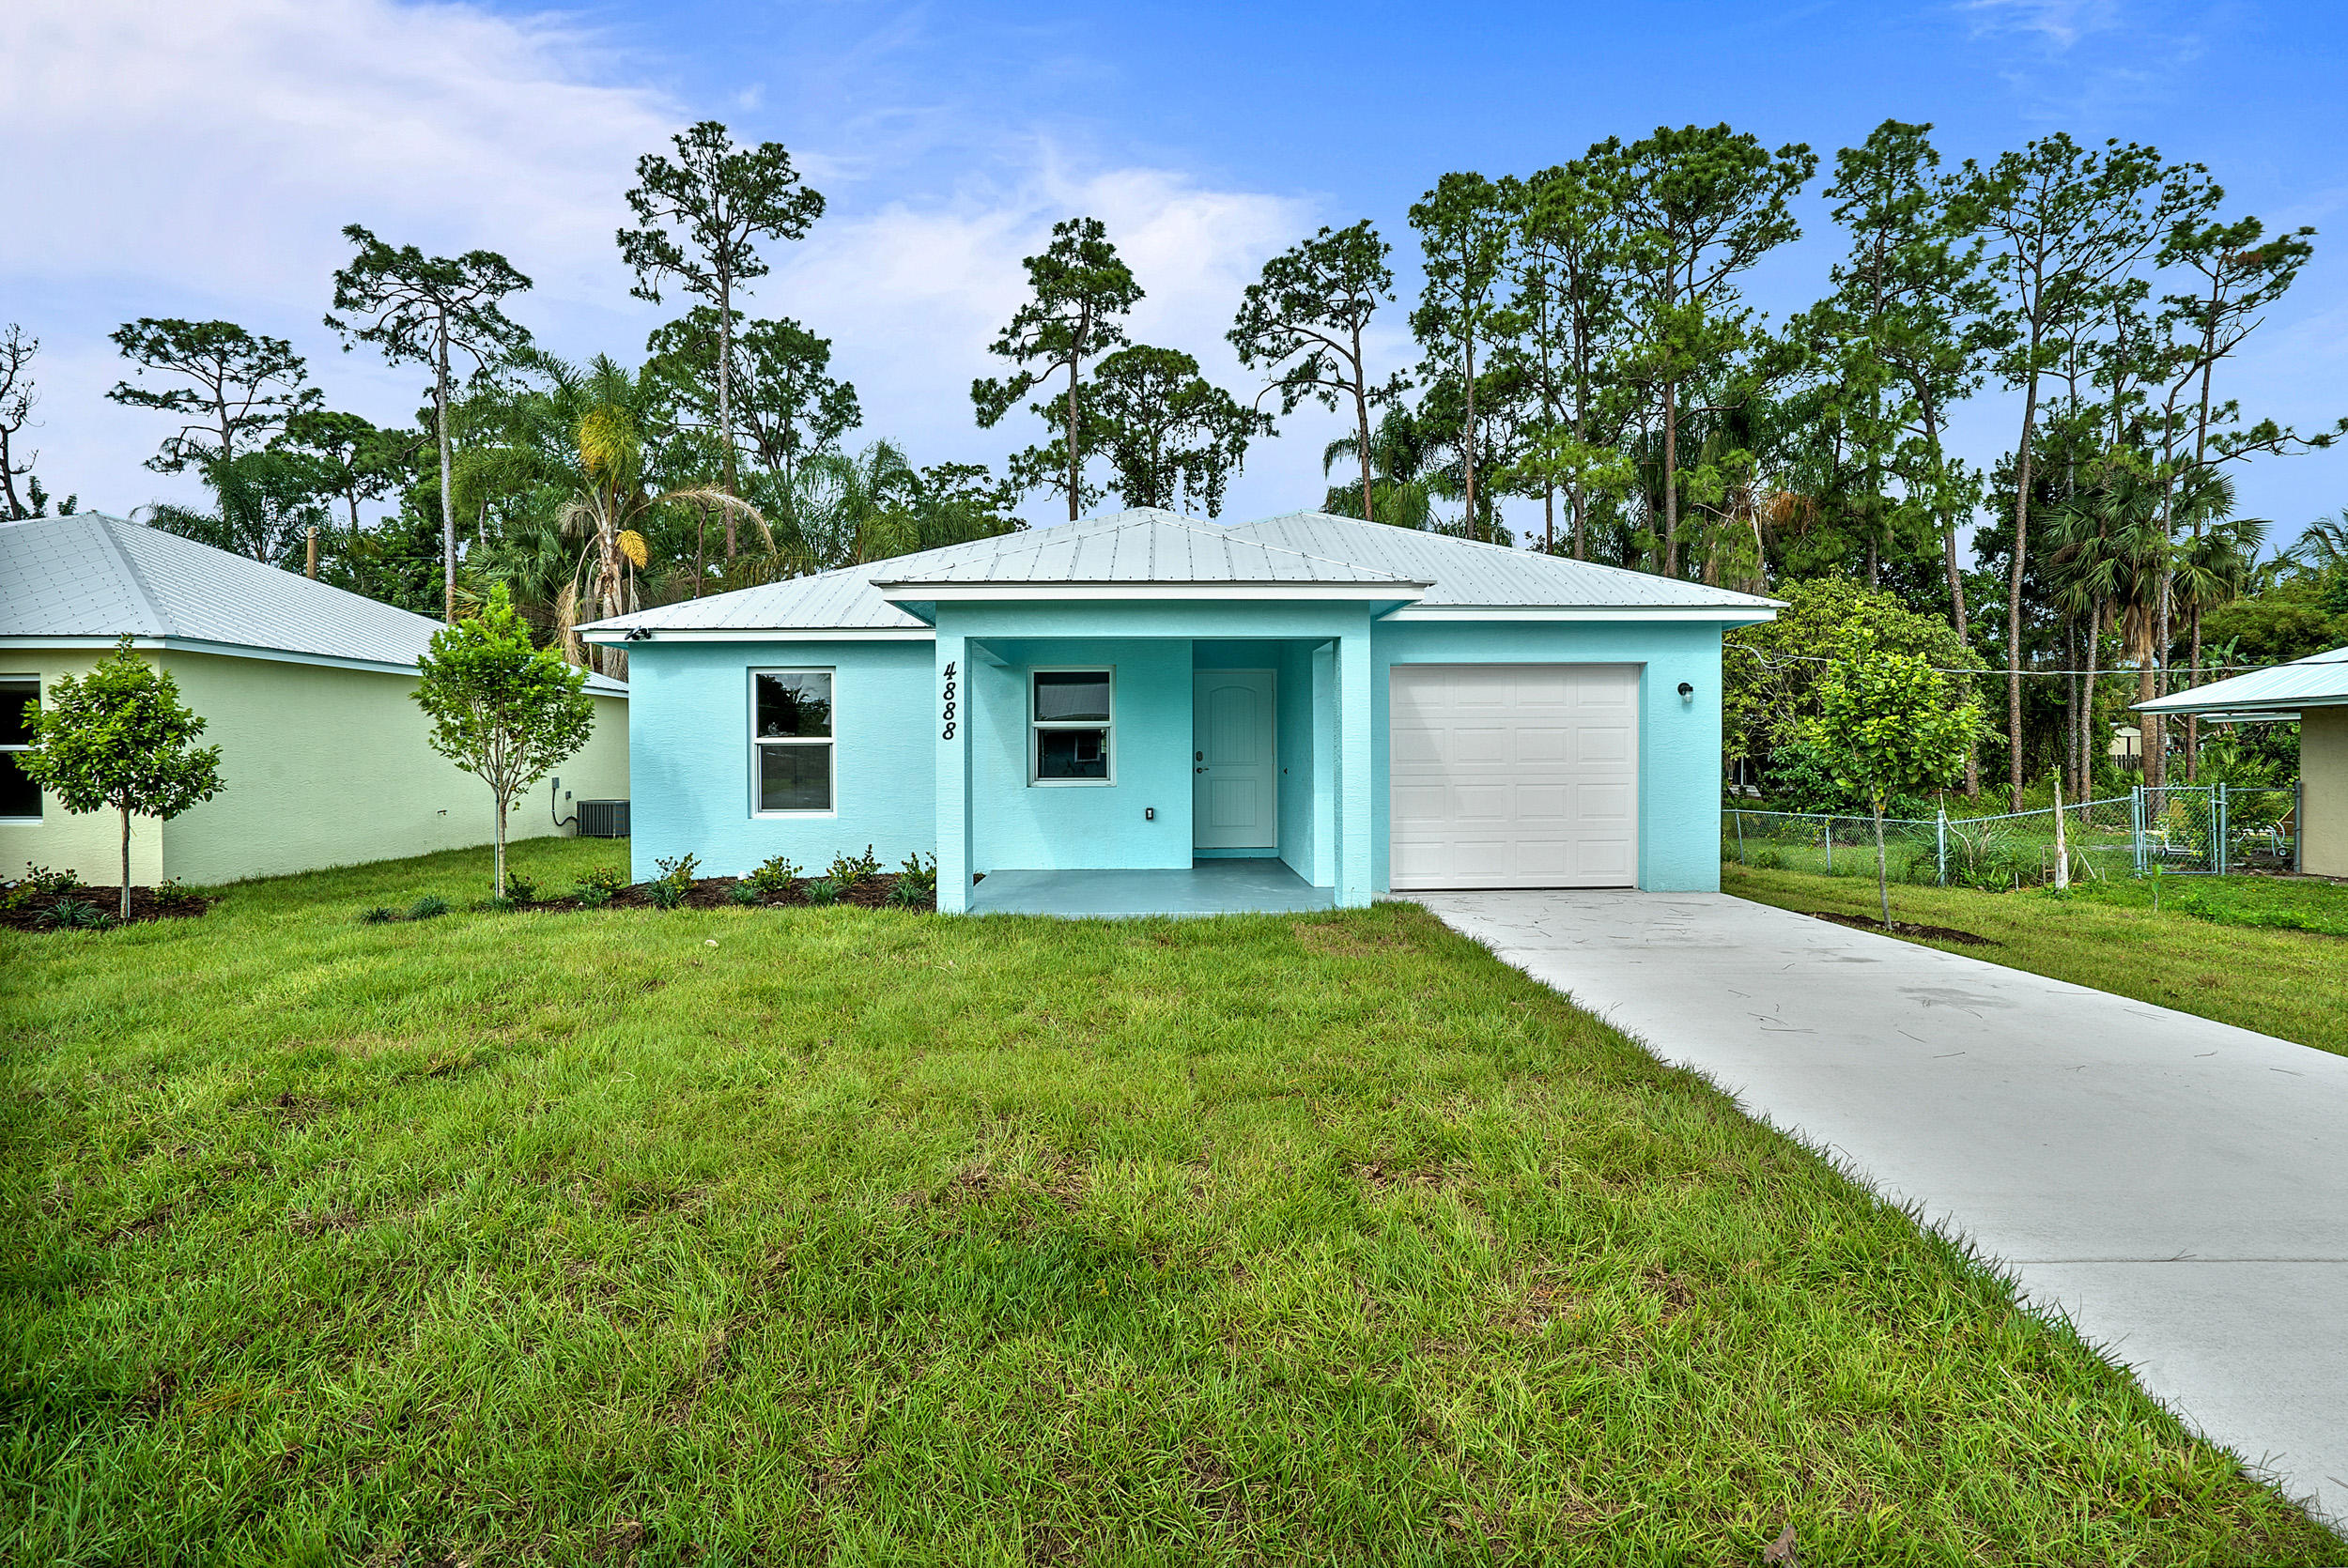 Photo of 4888 SE Isabelita Avenue, Stuart, FL 34997